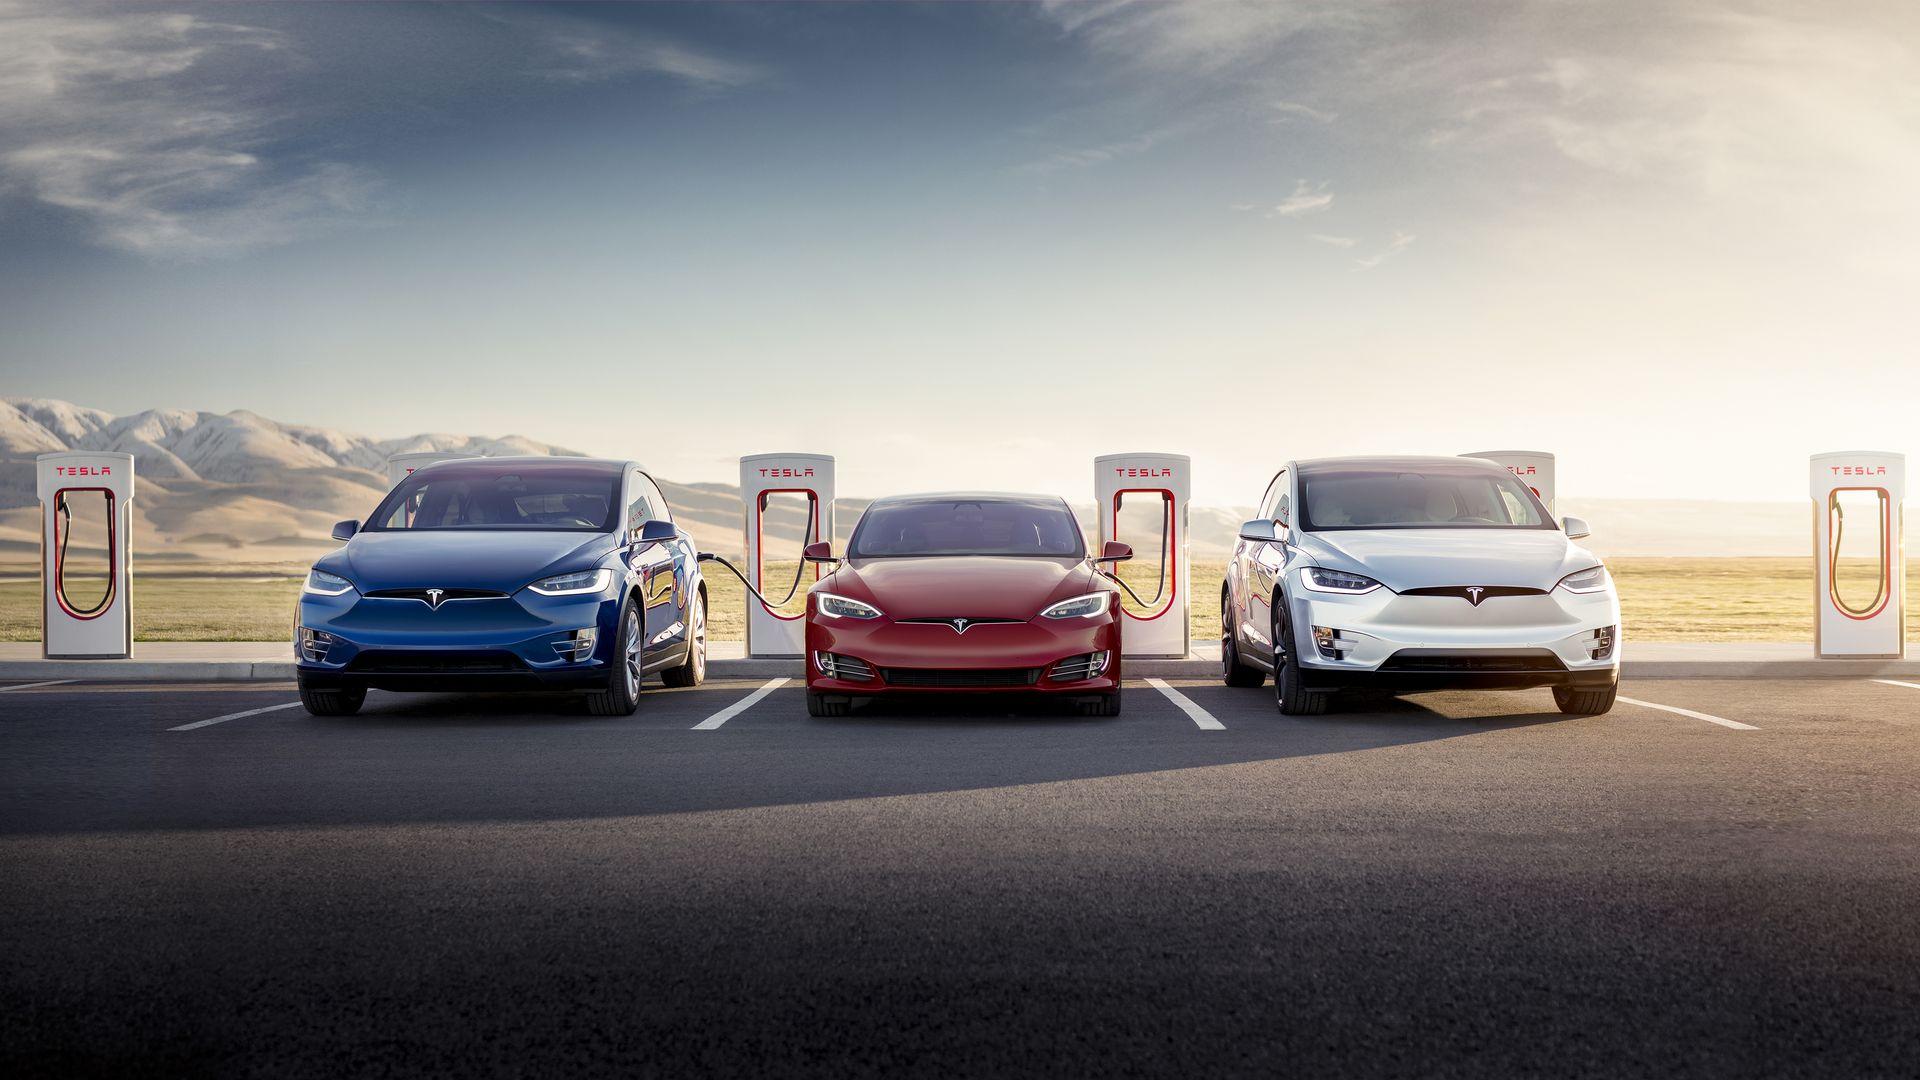 68577119d3 Tesla Priority Access to Vehicle Software Updates - Thomas Bensmann